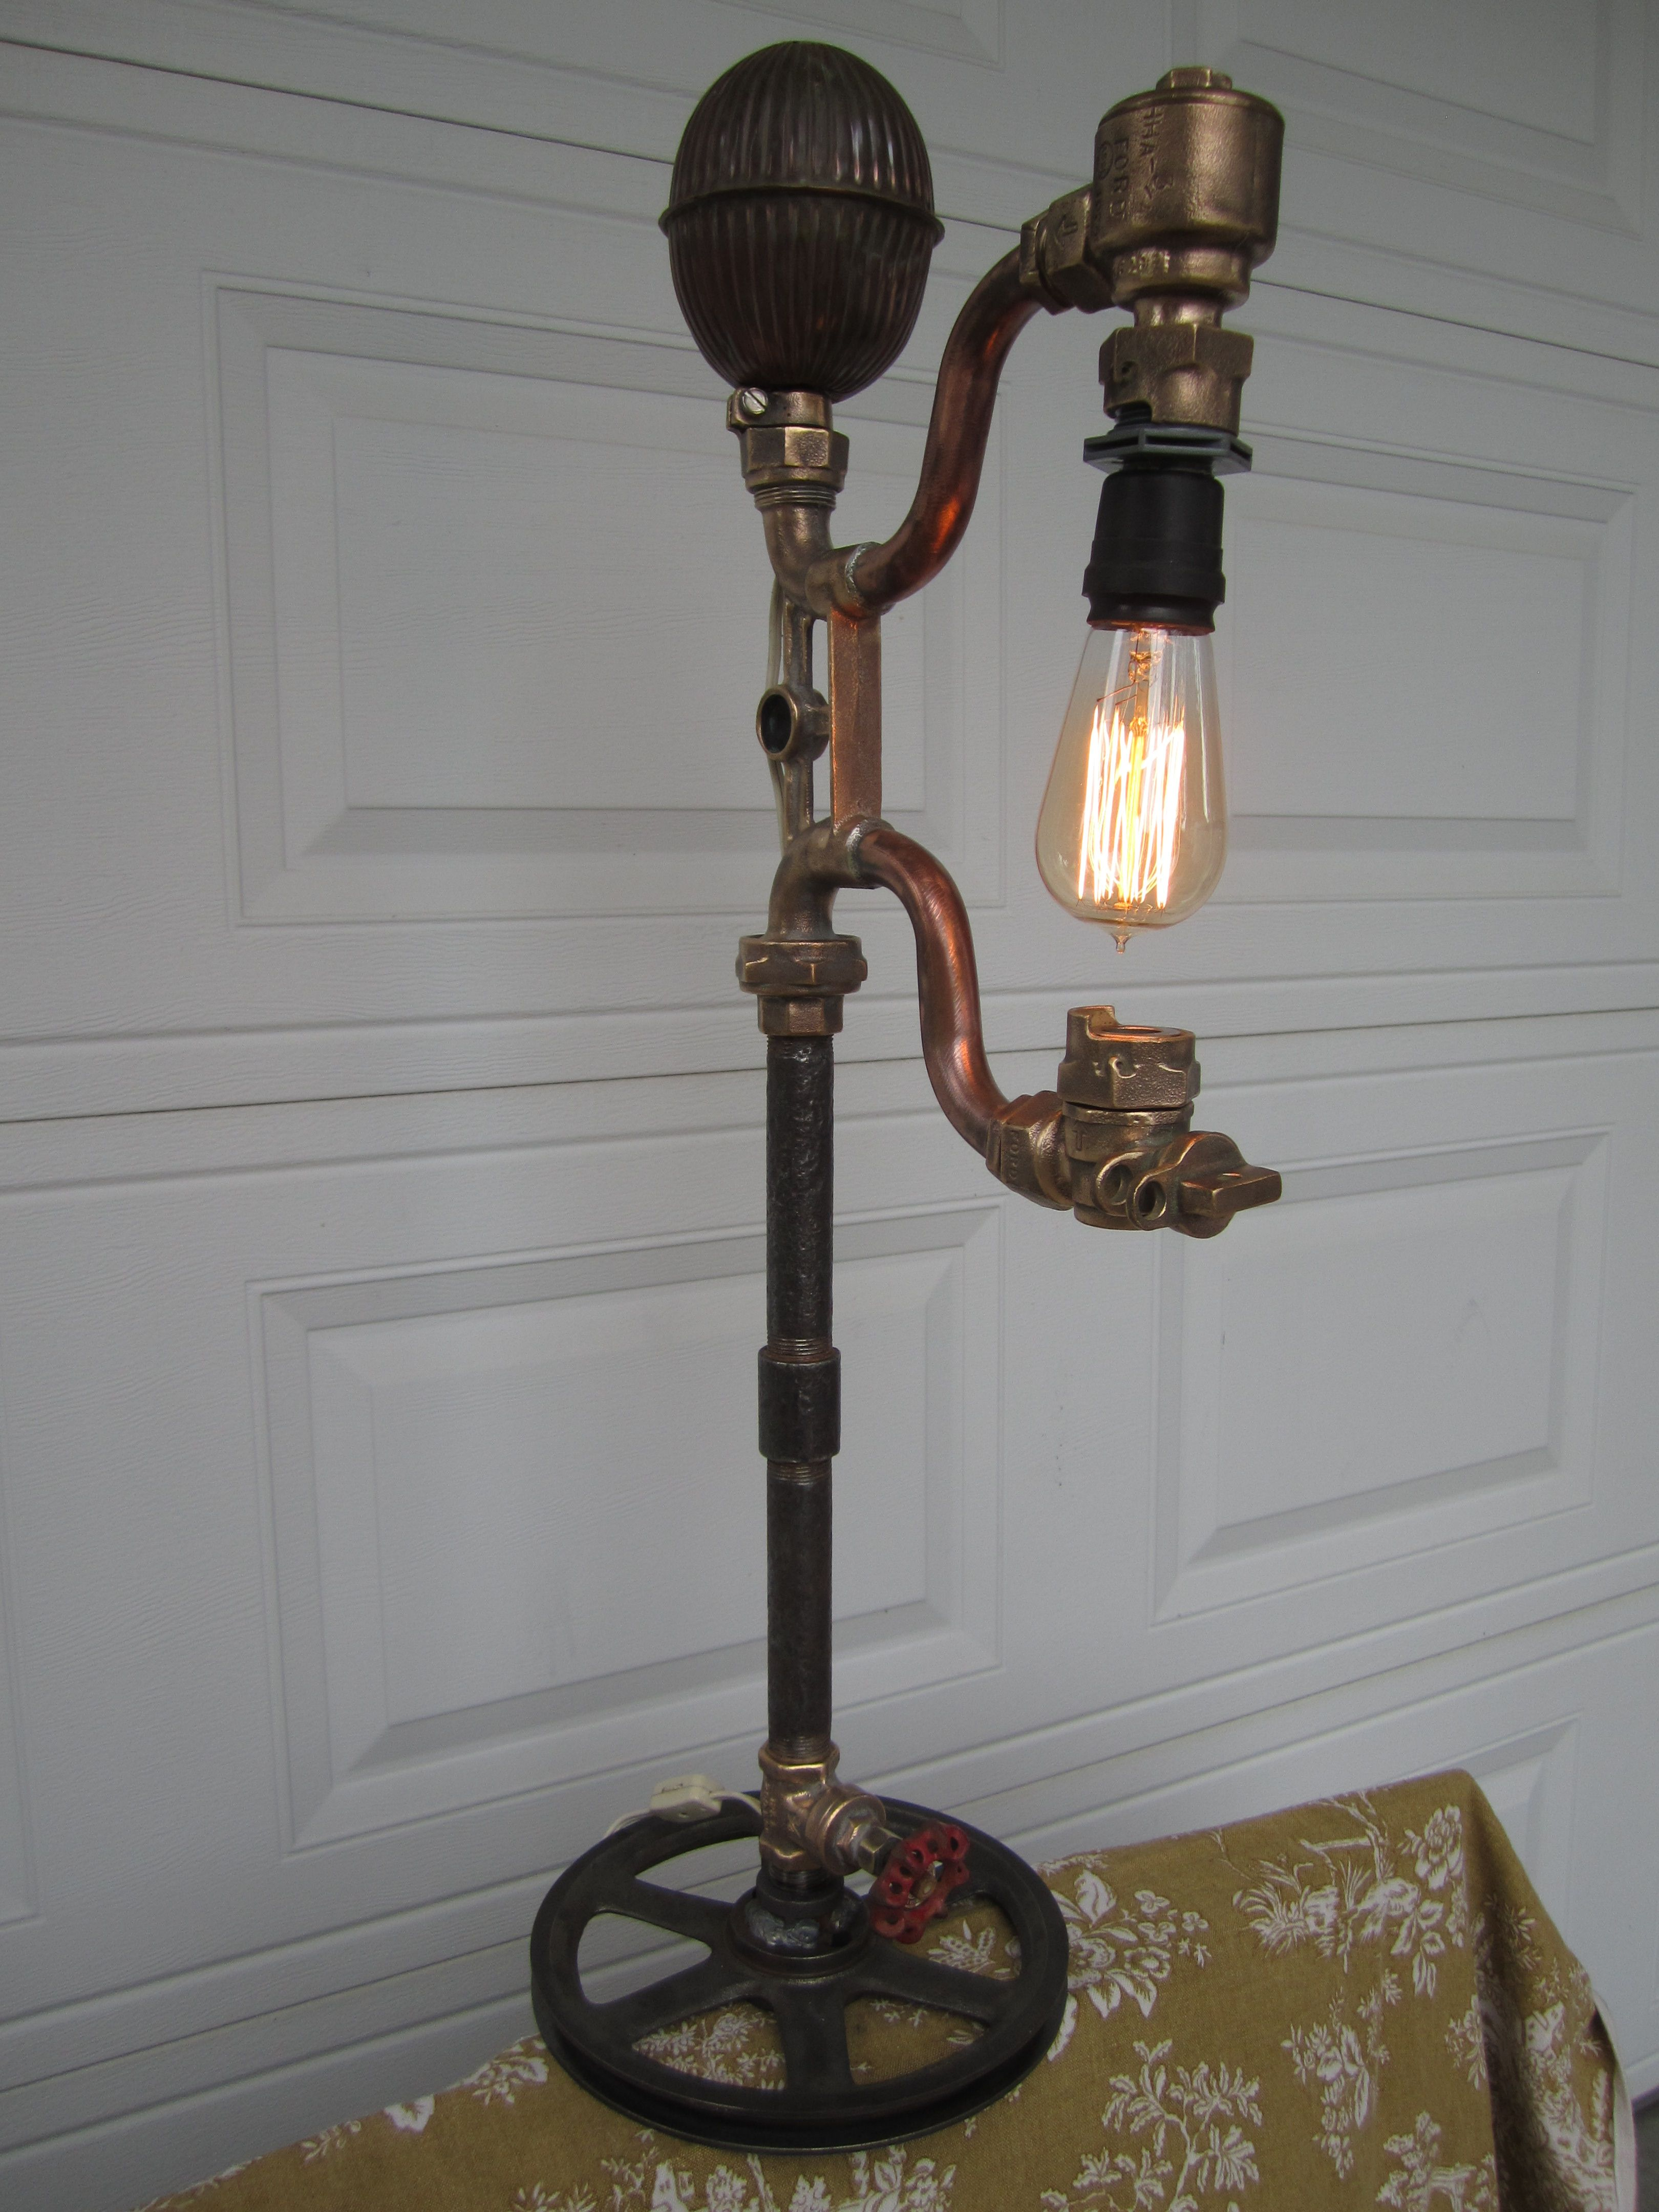 Lamp made from water meter yolk